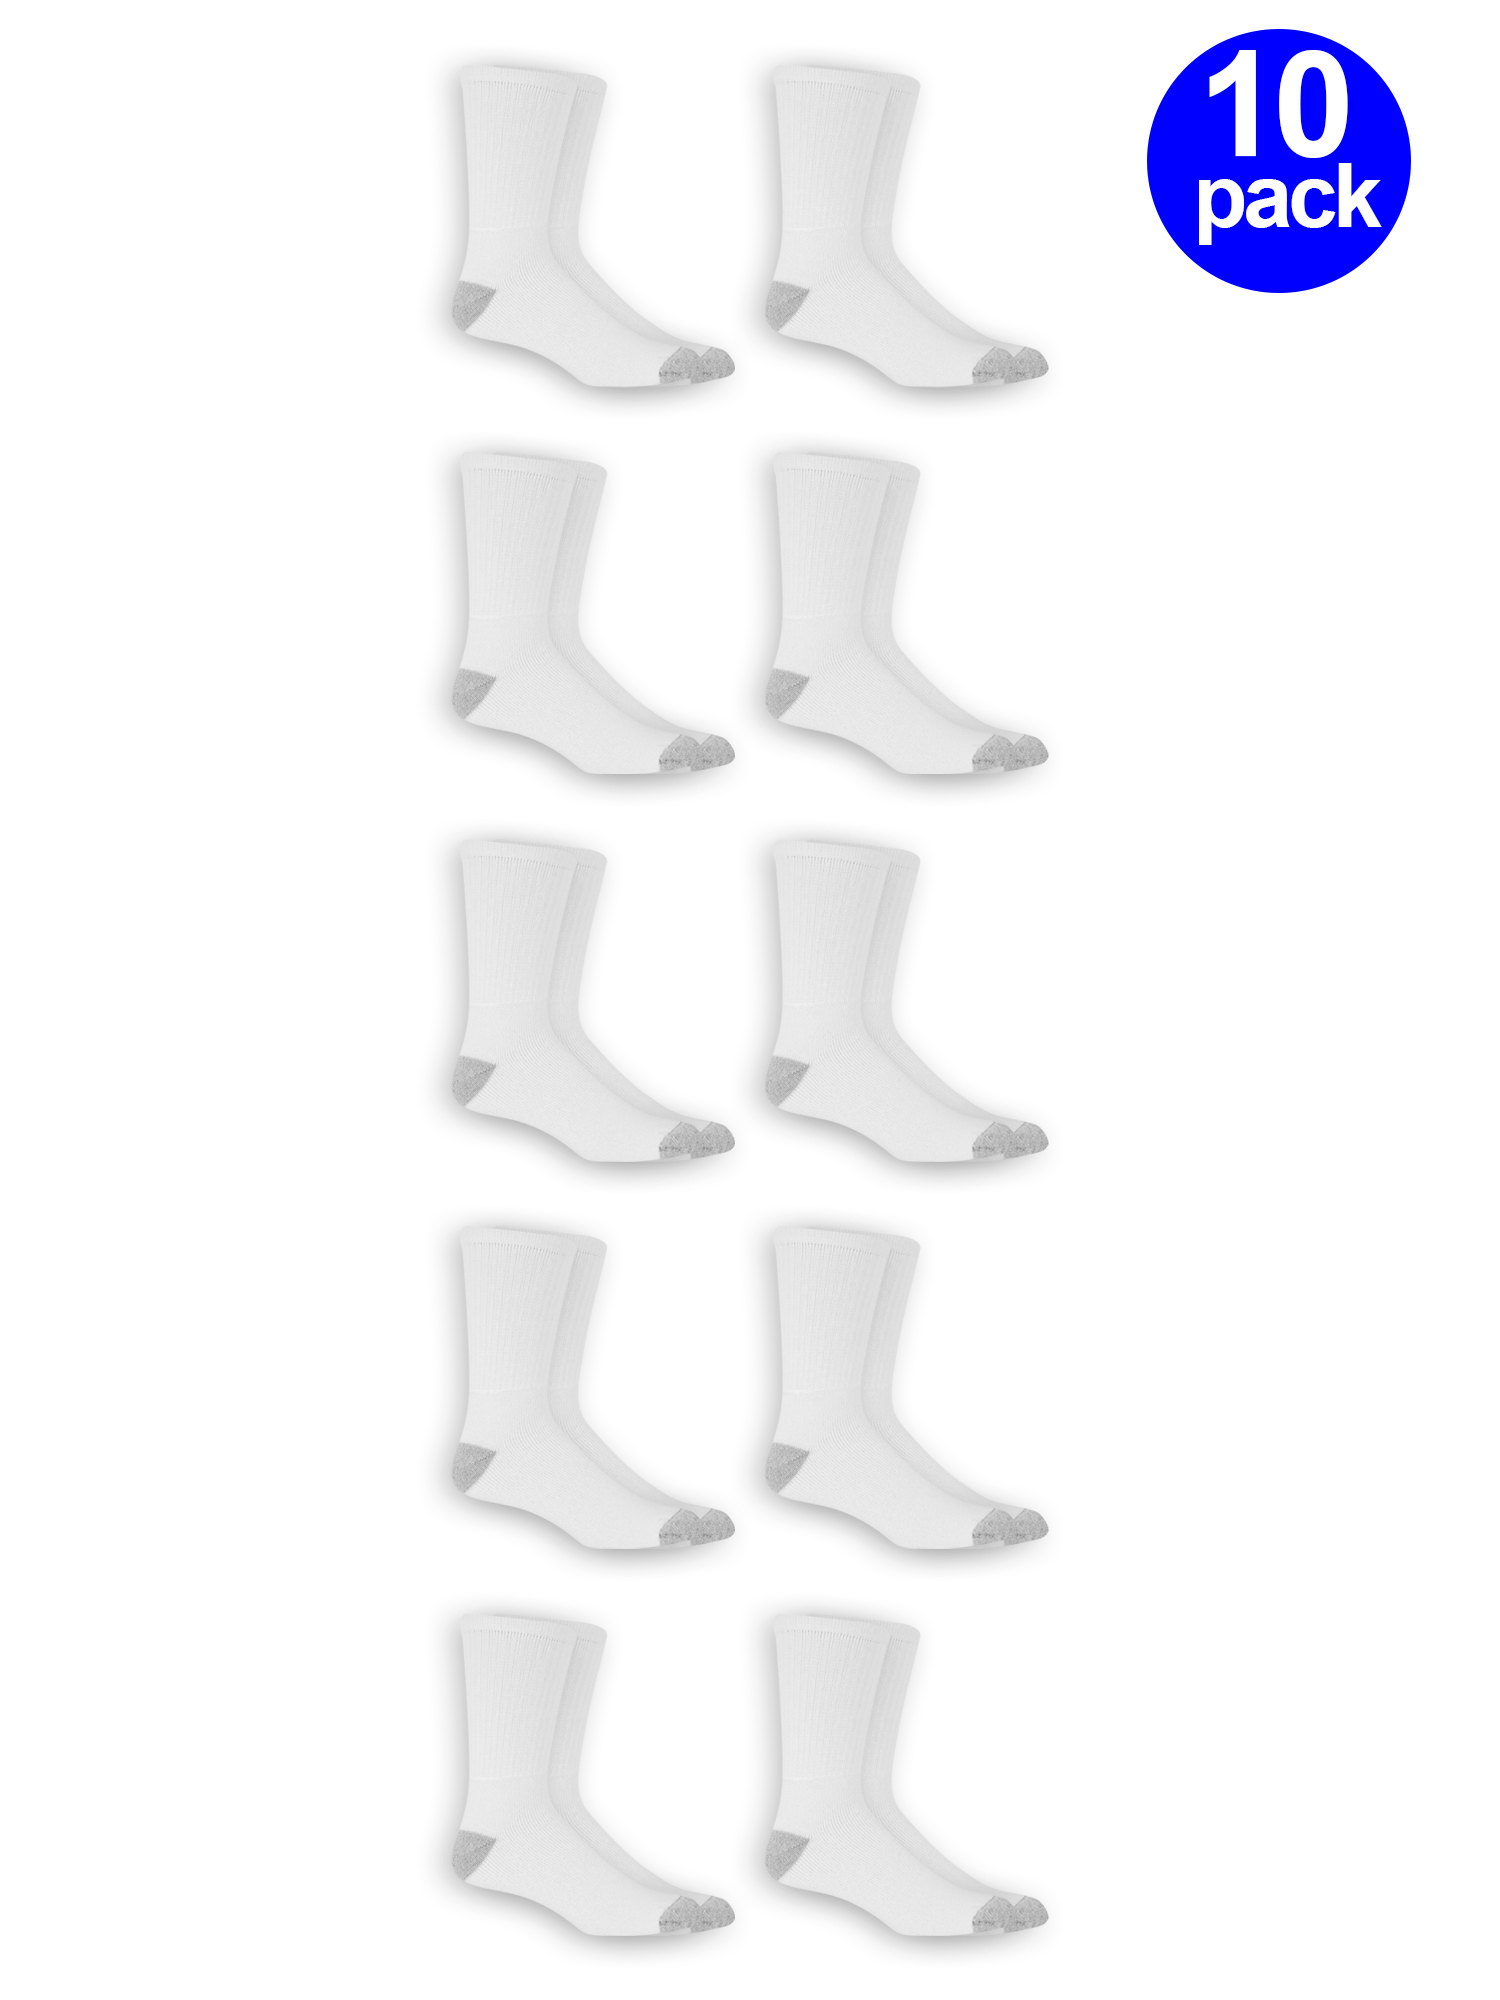 I Love Weight Lifting Training Printed Design on Mens Black Cotton Socks